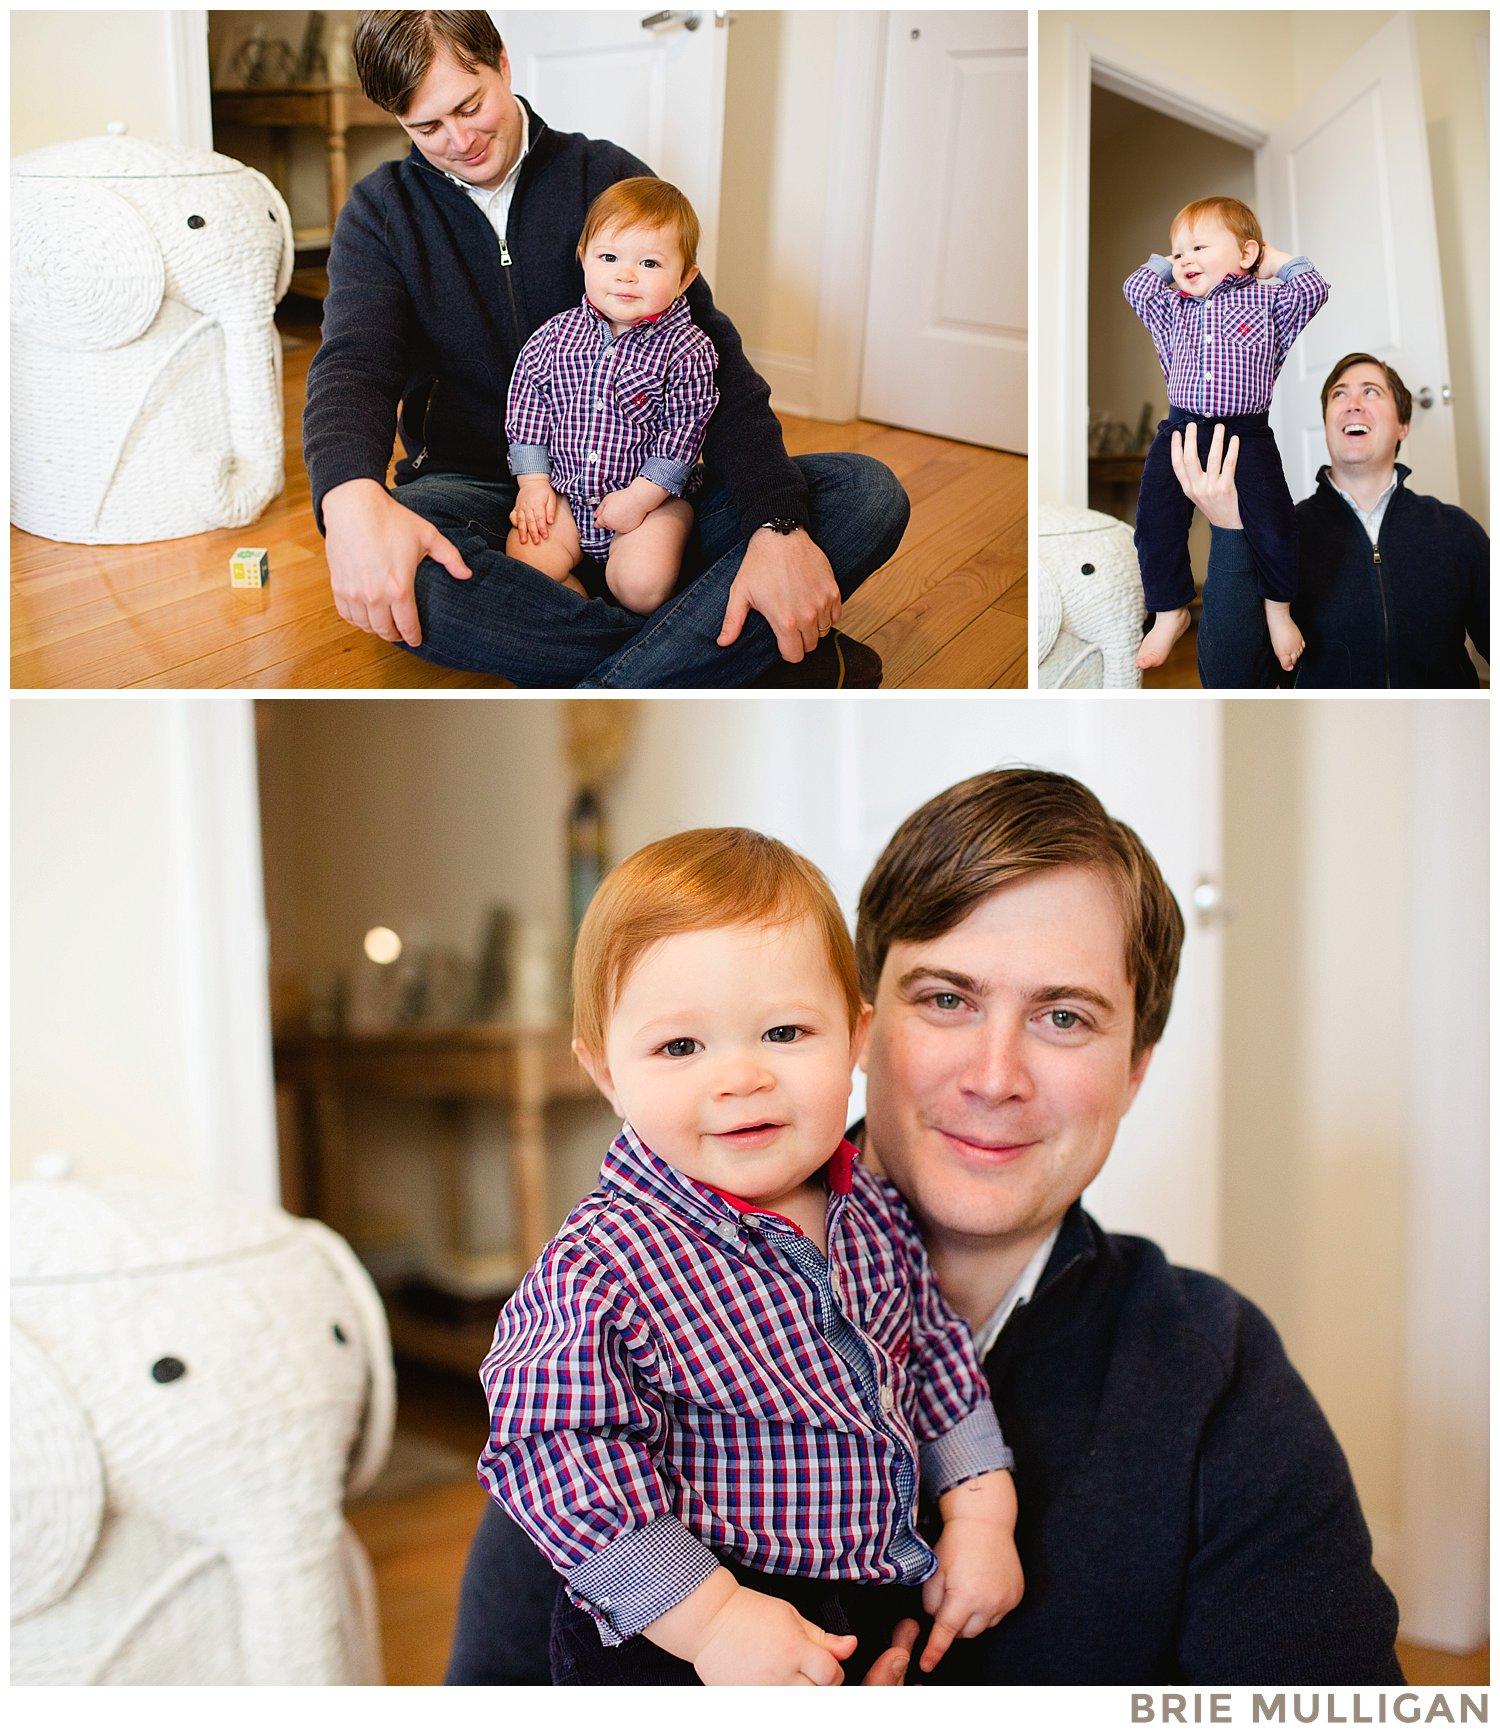 Brie-Mulligan-Family-and-Newborn-Photographer-NYC-and-Northern-NJ_0119.jpg